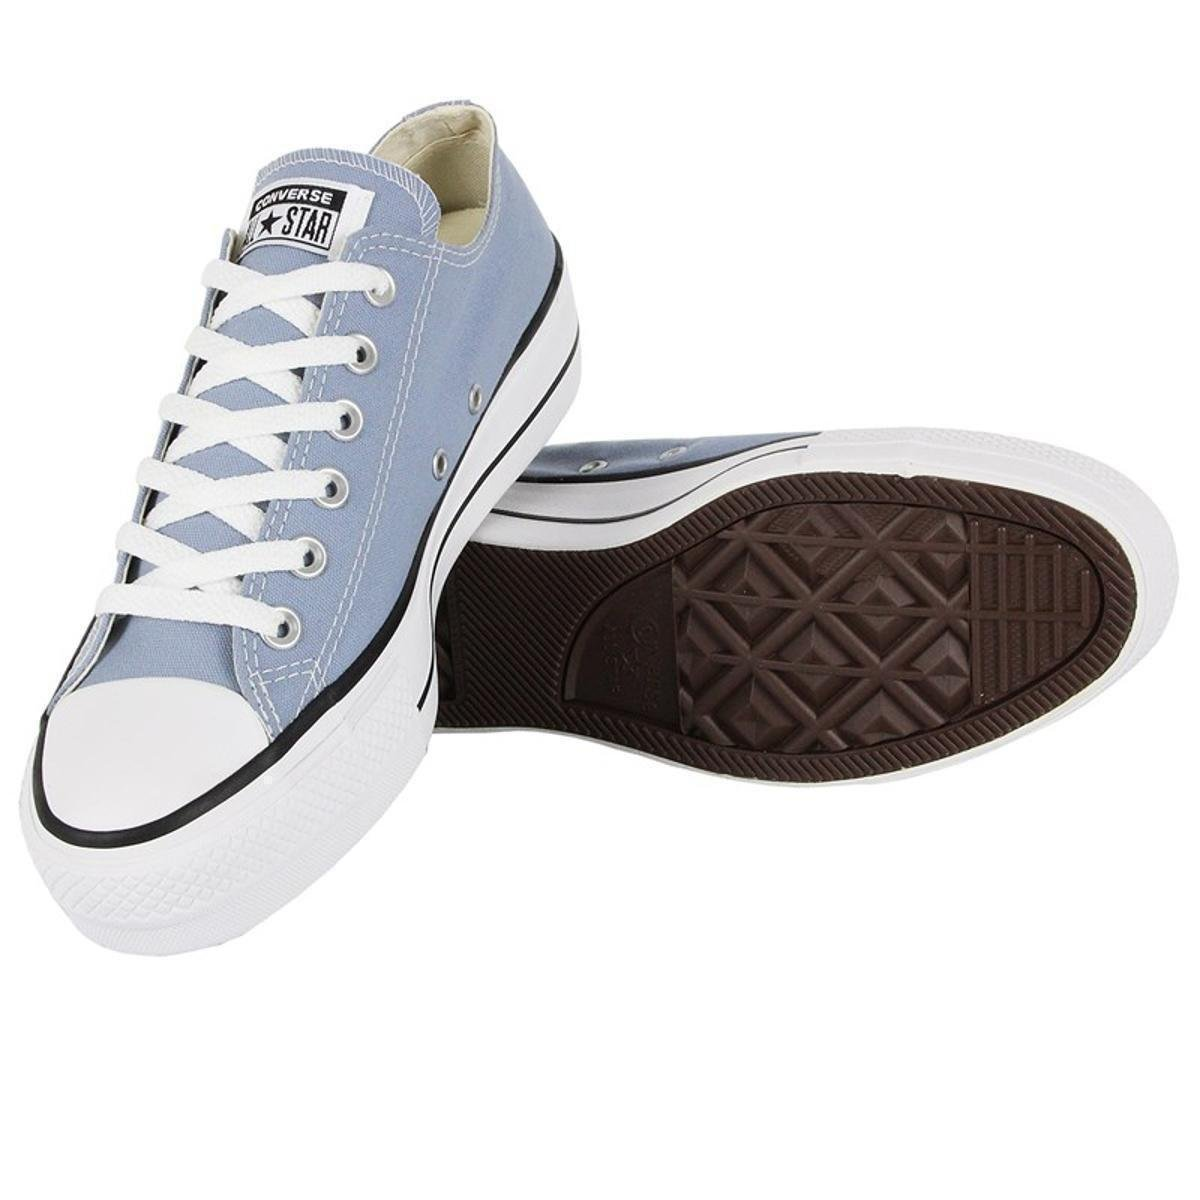 Tênis Converse Chuck Taylor All Star Feminino - Azul